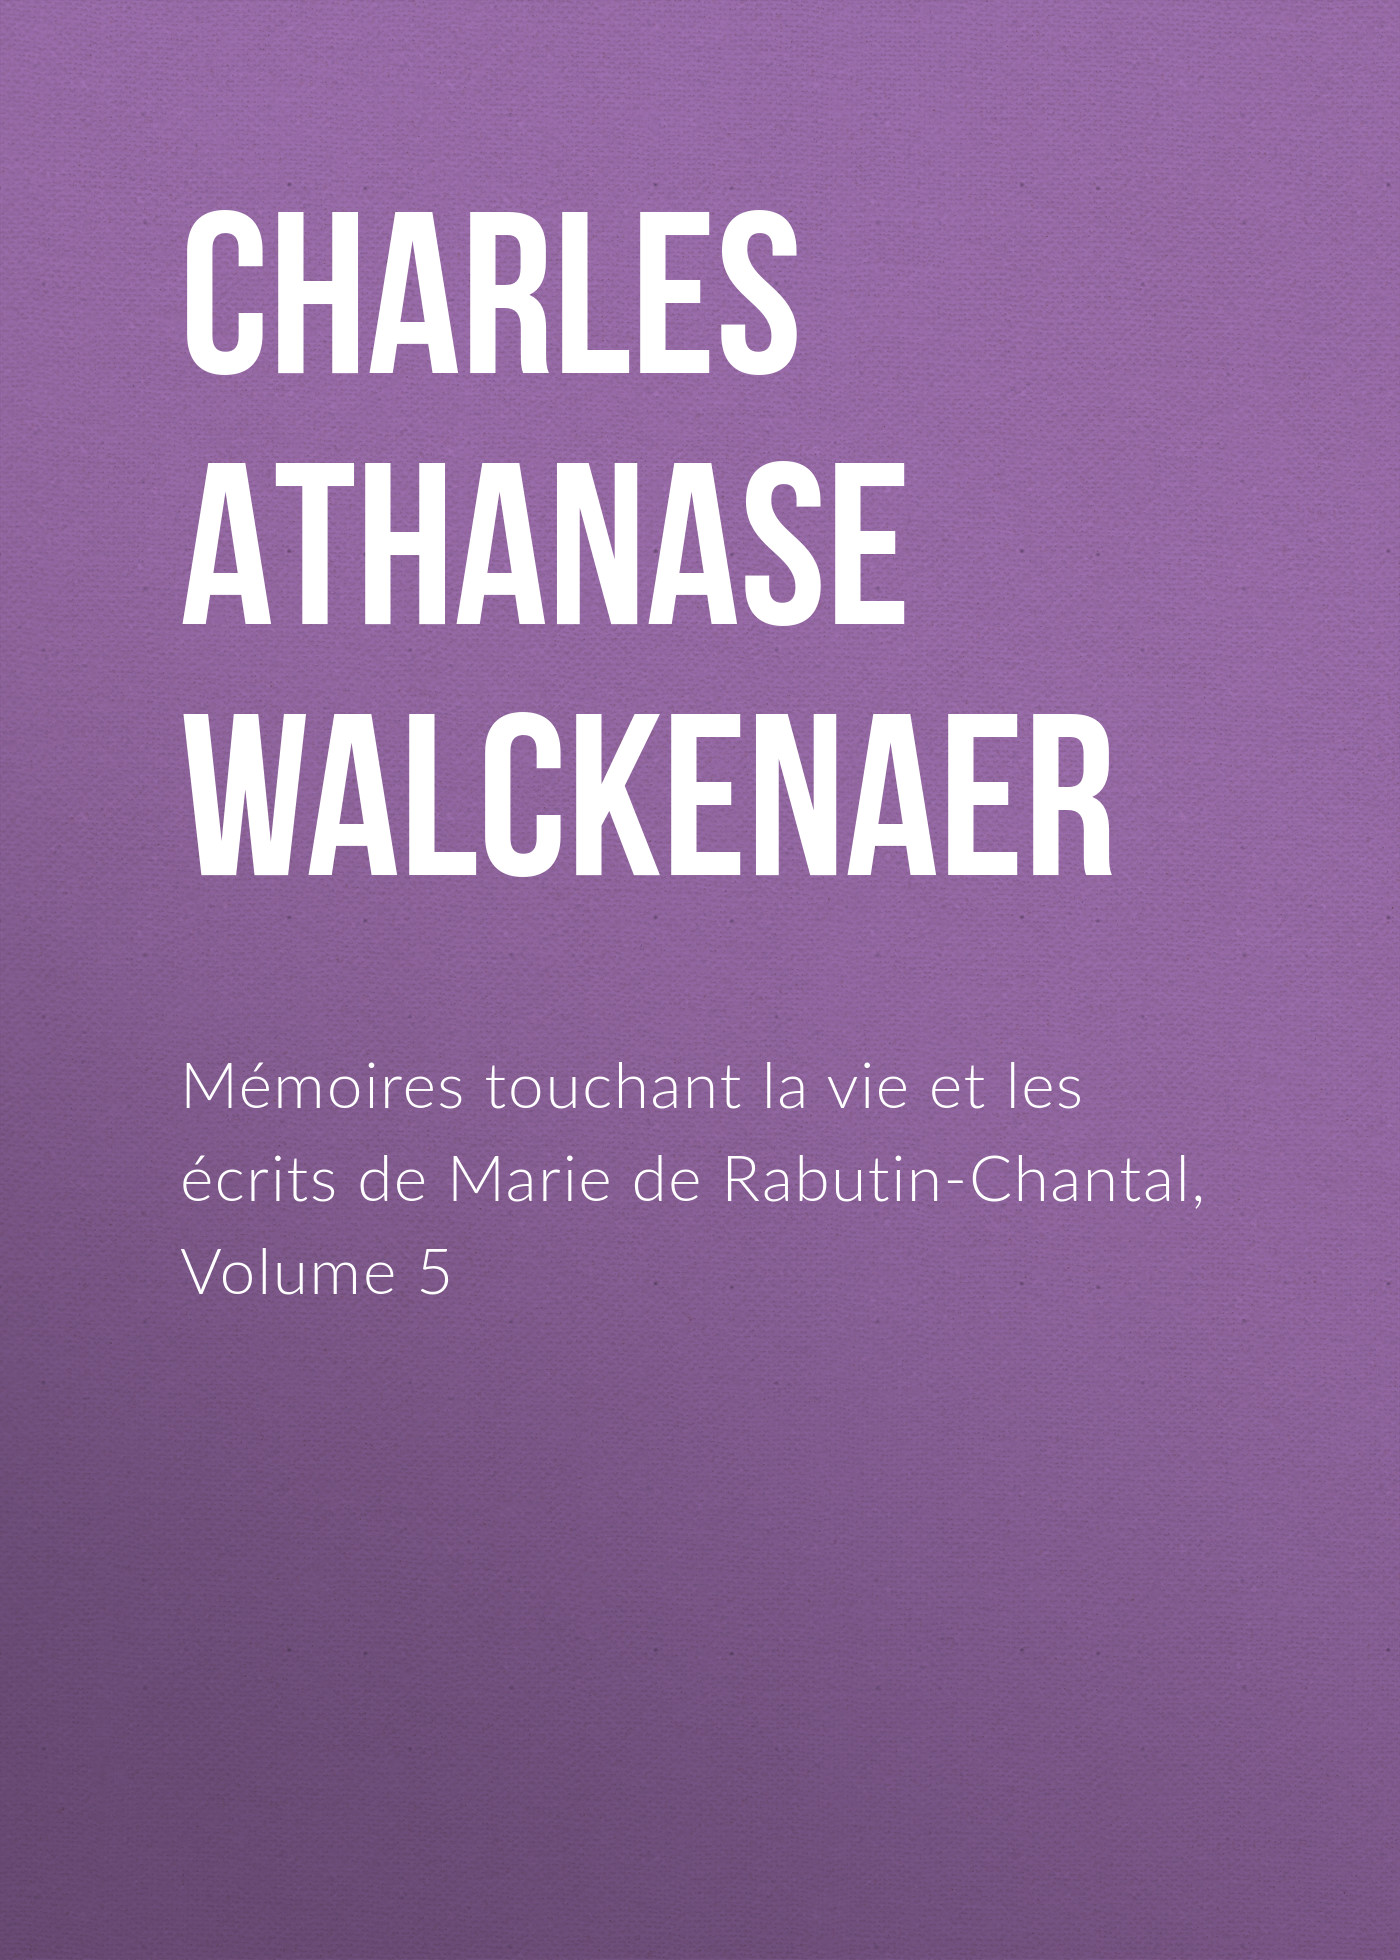 Charles Athanase Walckenaer Mémoires touchant la vie et les écrits de Marie de Rabutin-Chantal, Volume 5 charles soule robert venditti tony bedard red lanterns volume 5 atrocities